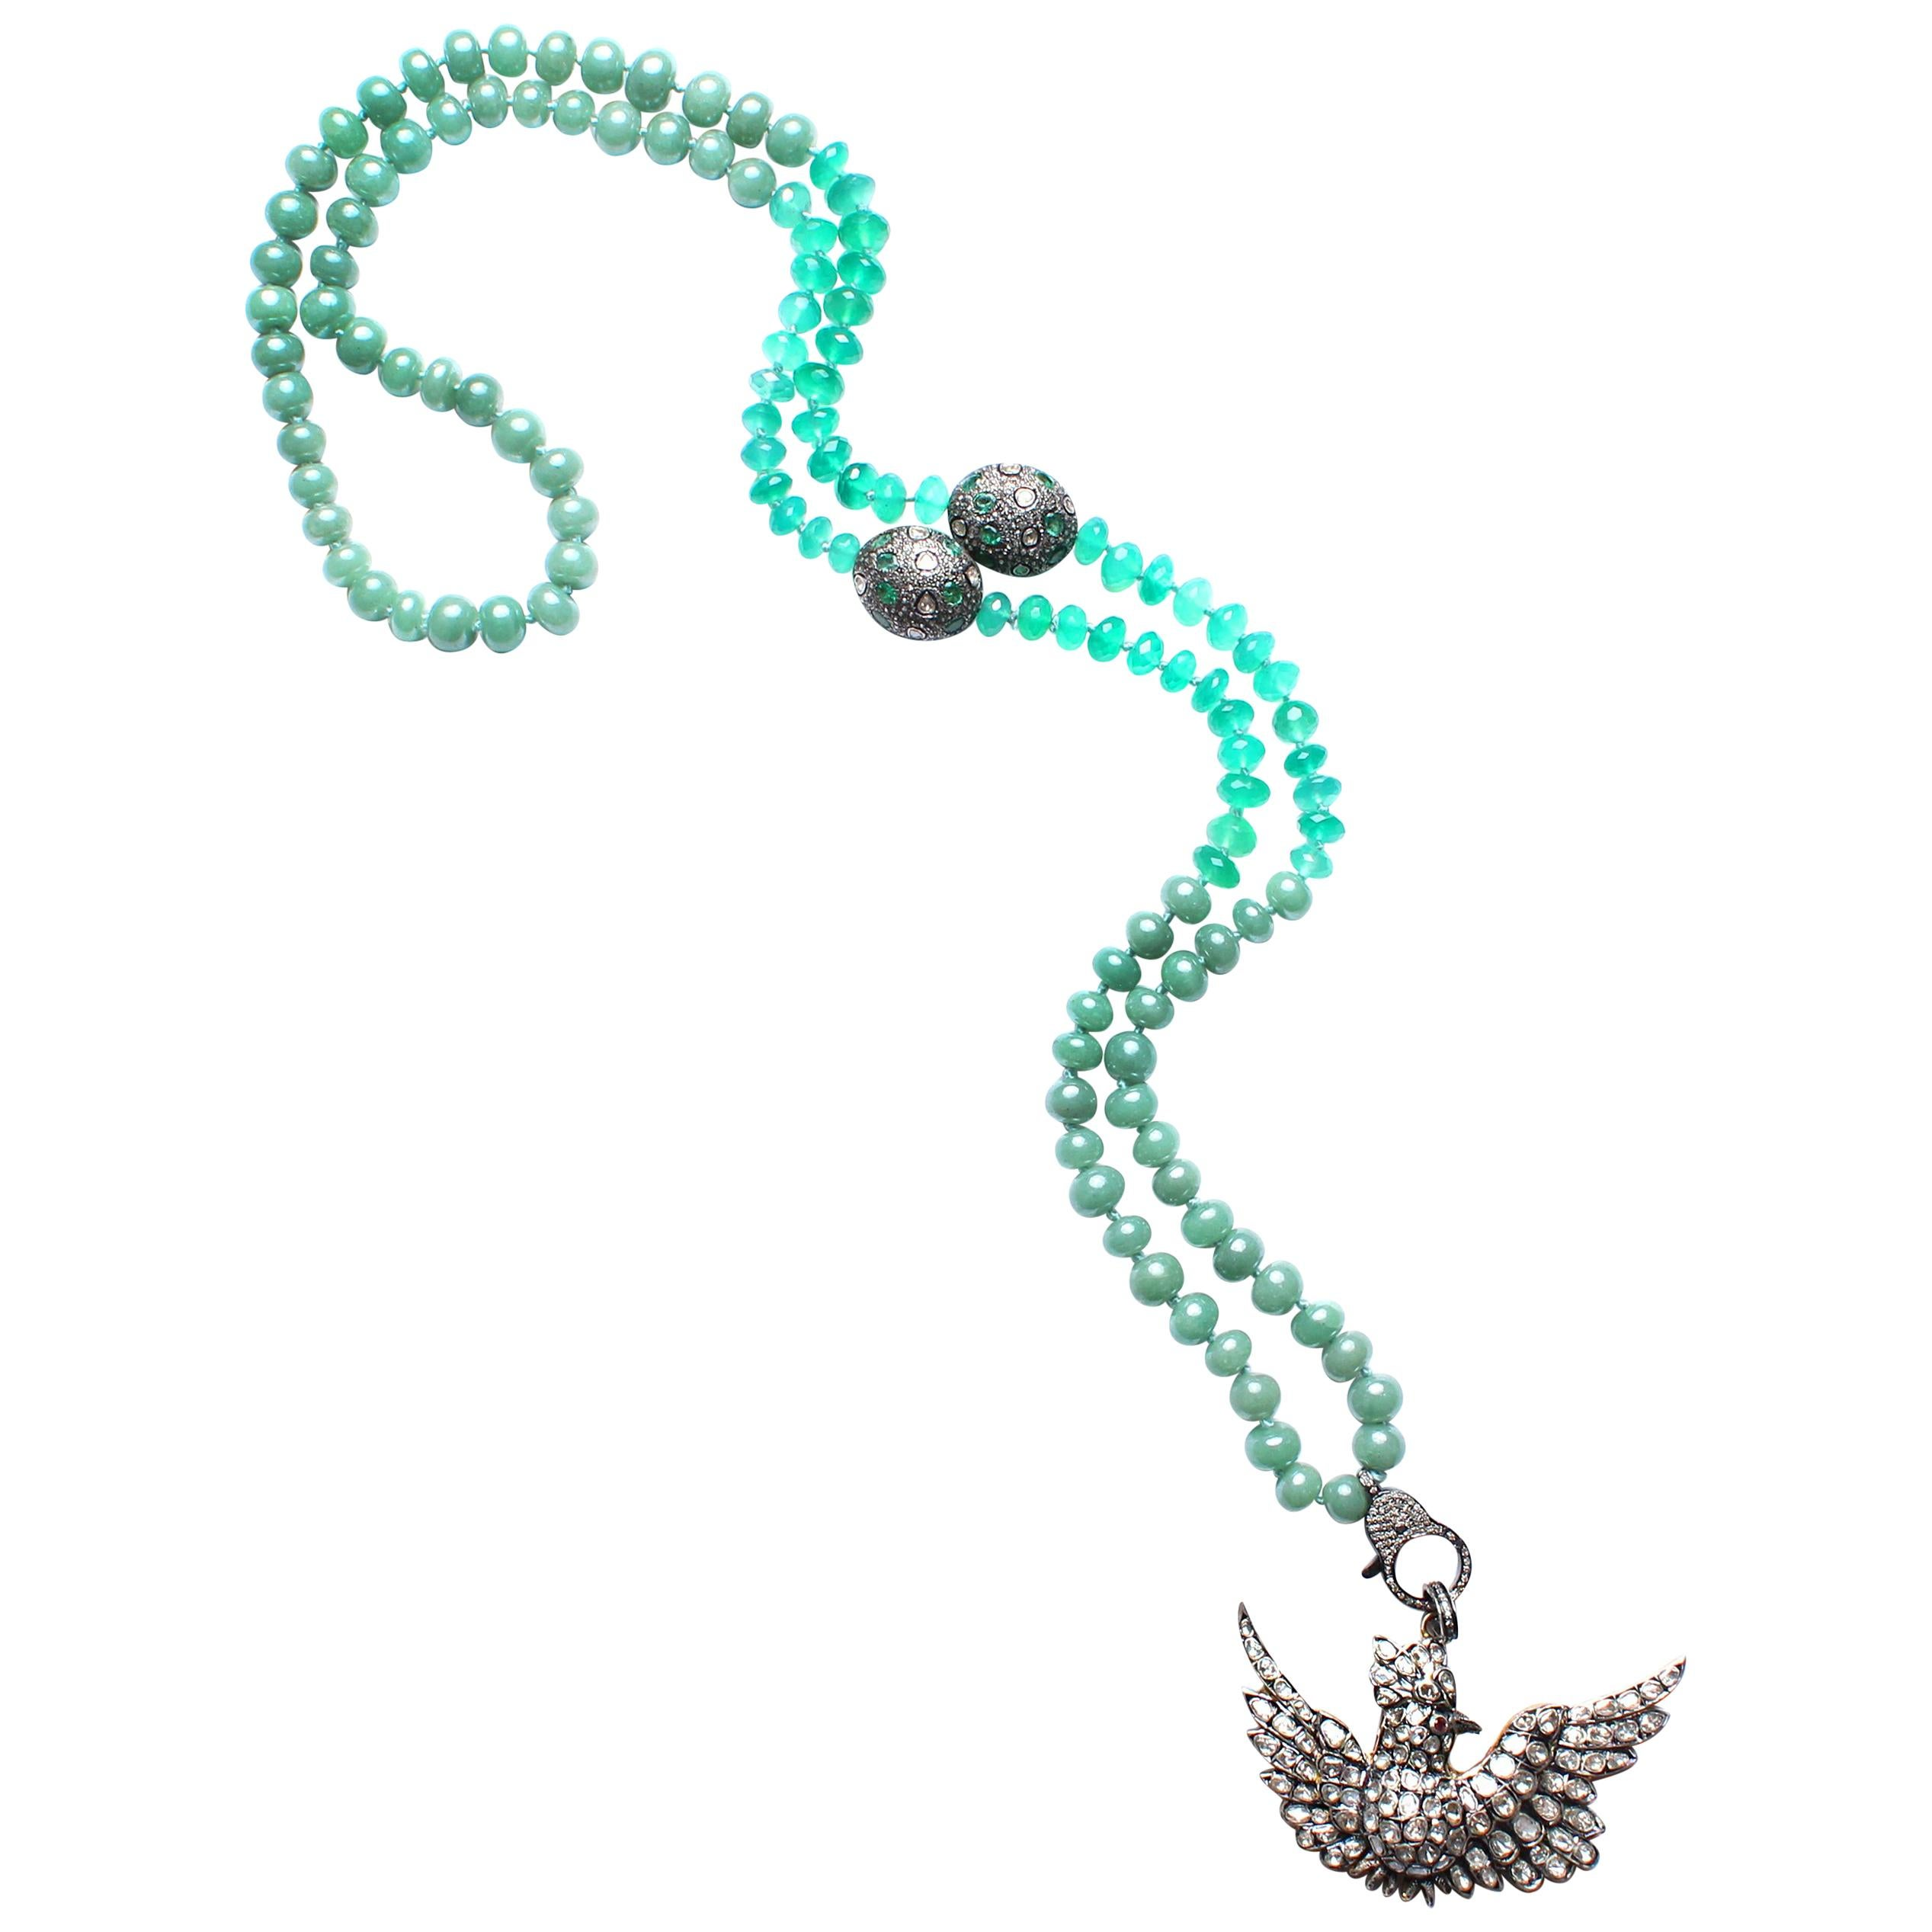 Clarissa Bronfman Emerald, Jade, Diamond, Ruby Cardinal Bird Beaded Necklace